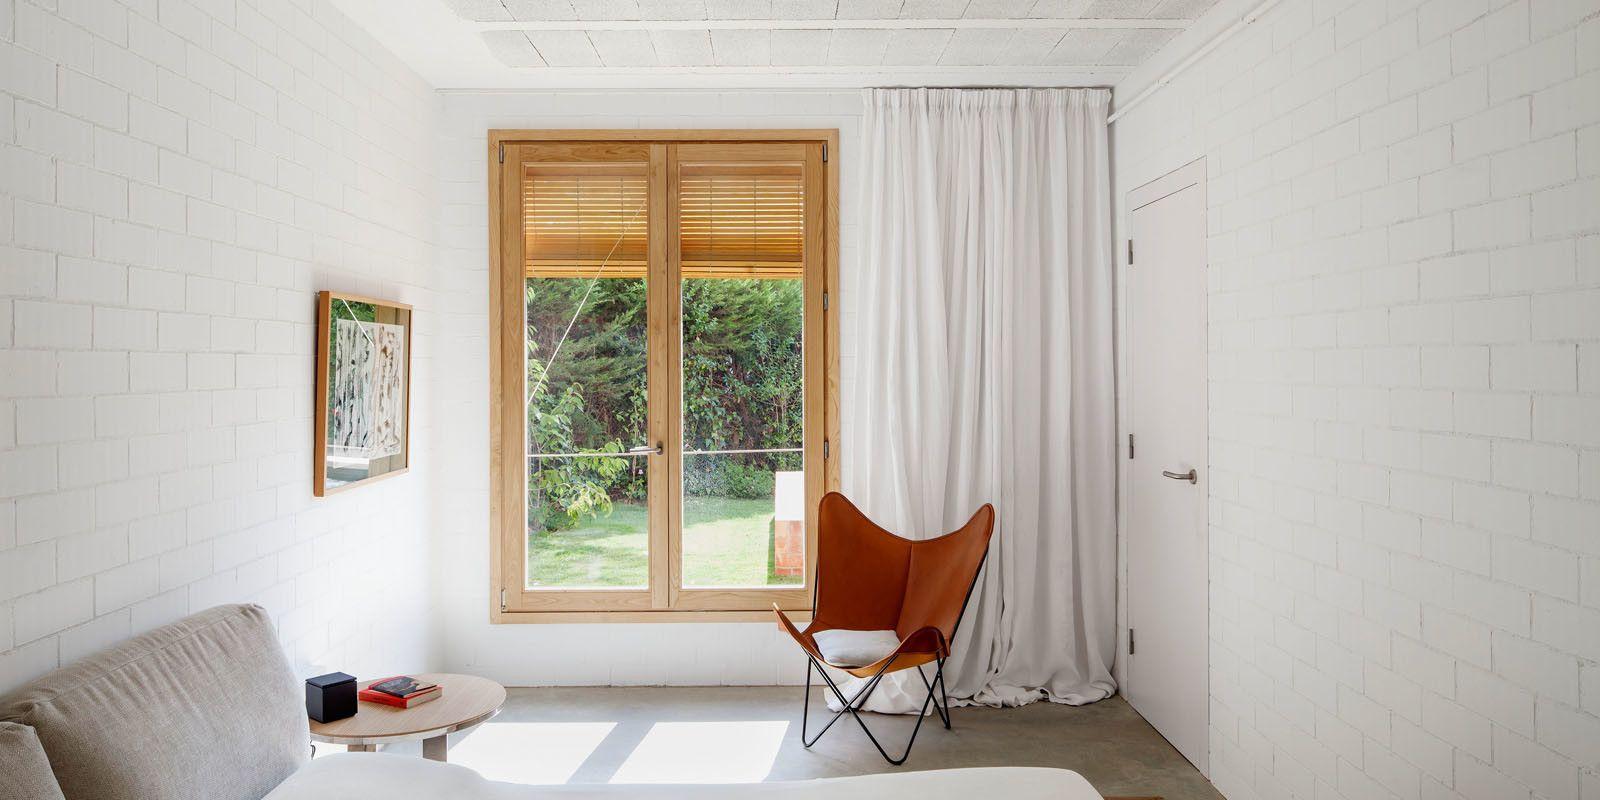 Casa 1101 In Sant Cugat Del Vall S Mauerwerk Wohnen Efh  # Muebles Sant Cugat Del Valles